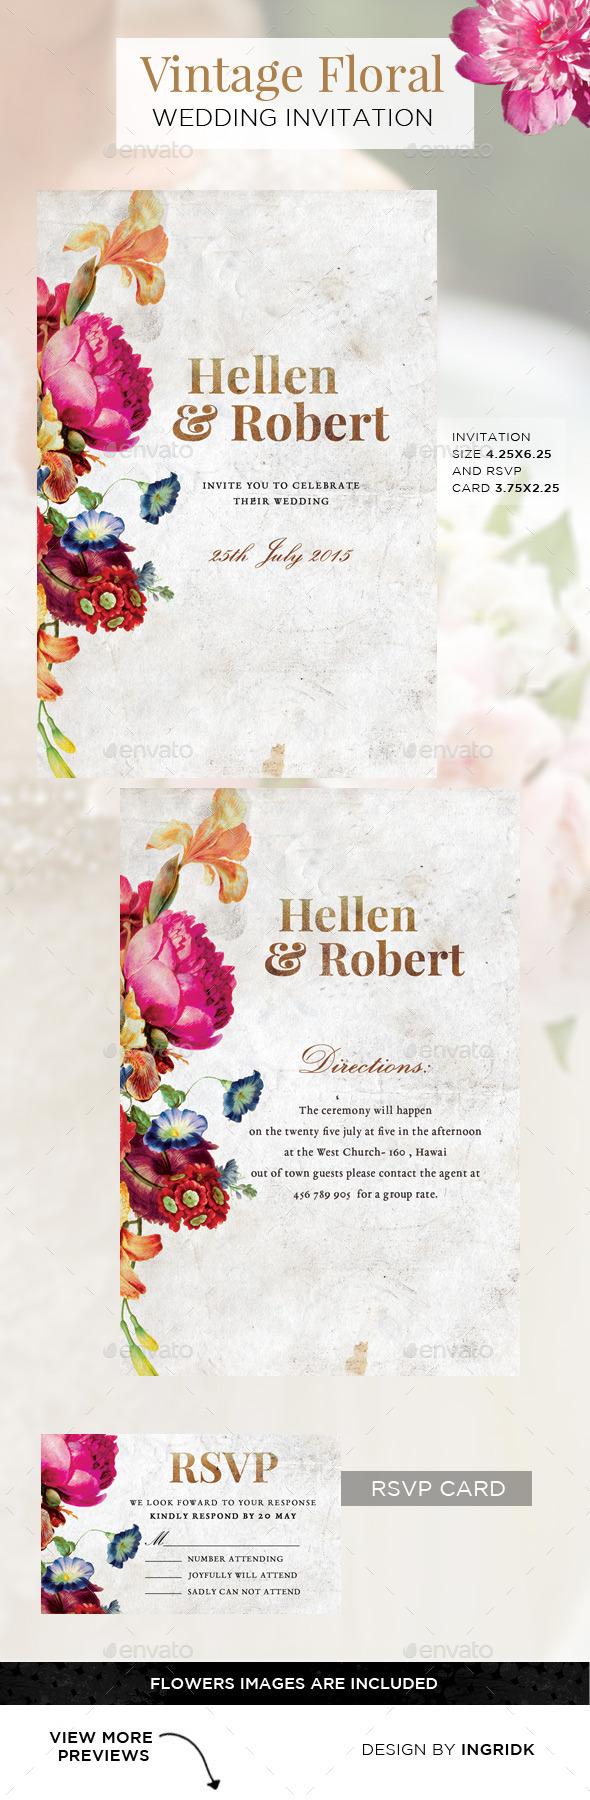 Vintage Floral Wedding Invitation with RSVP Card by ingridk ...